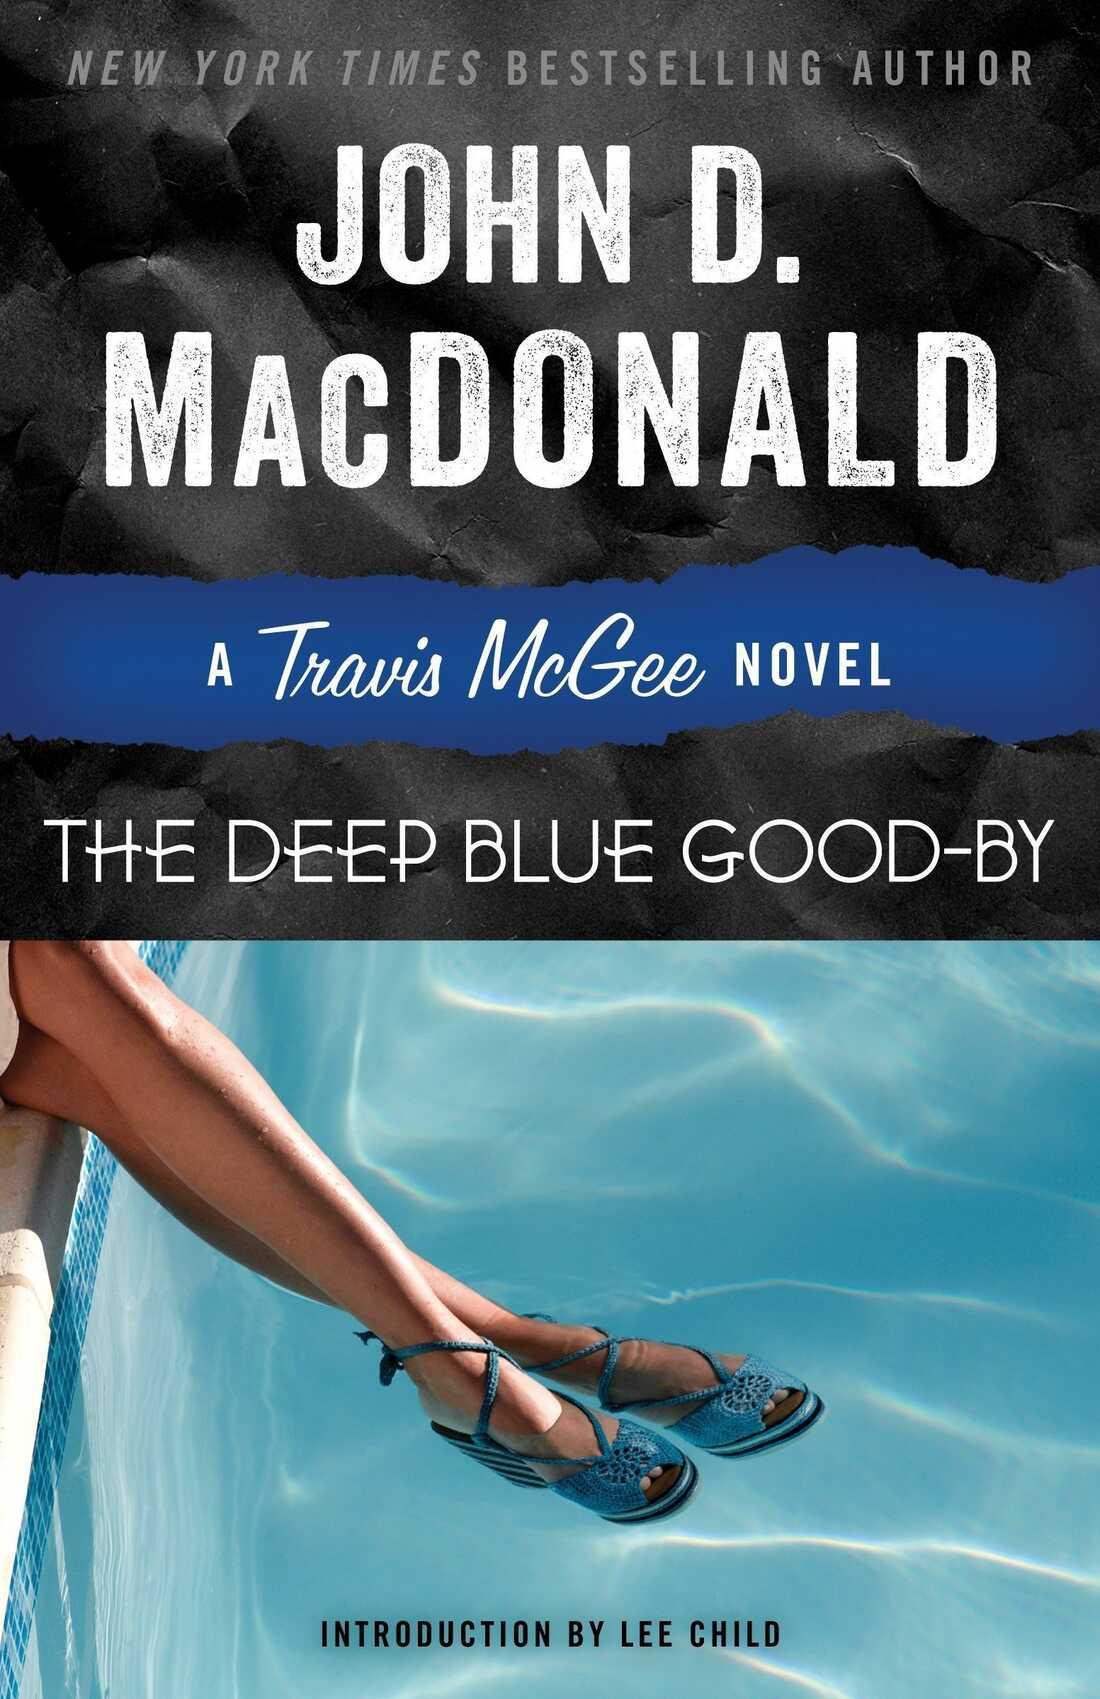 The Deep Blue Good-by, by John D. MacDonald